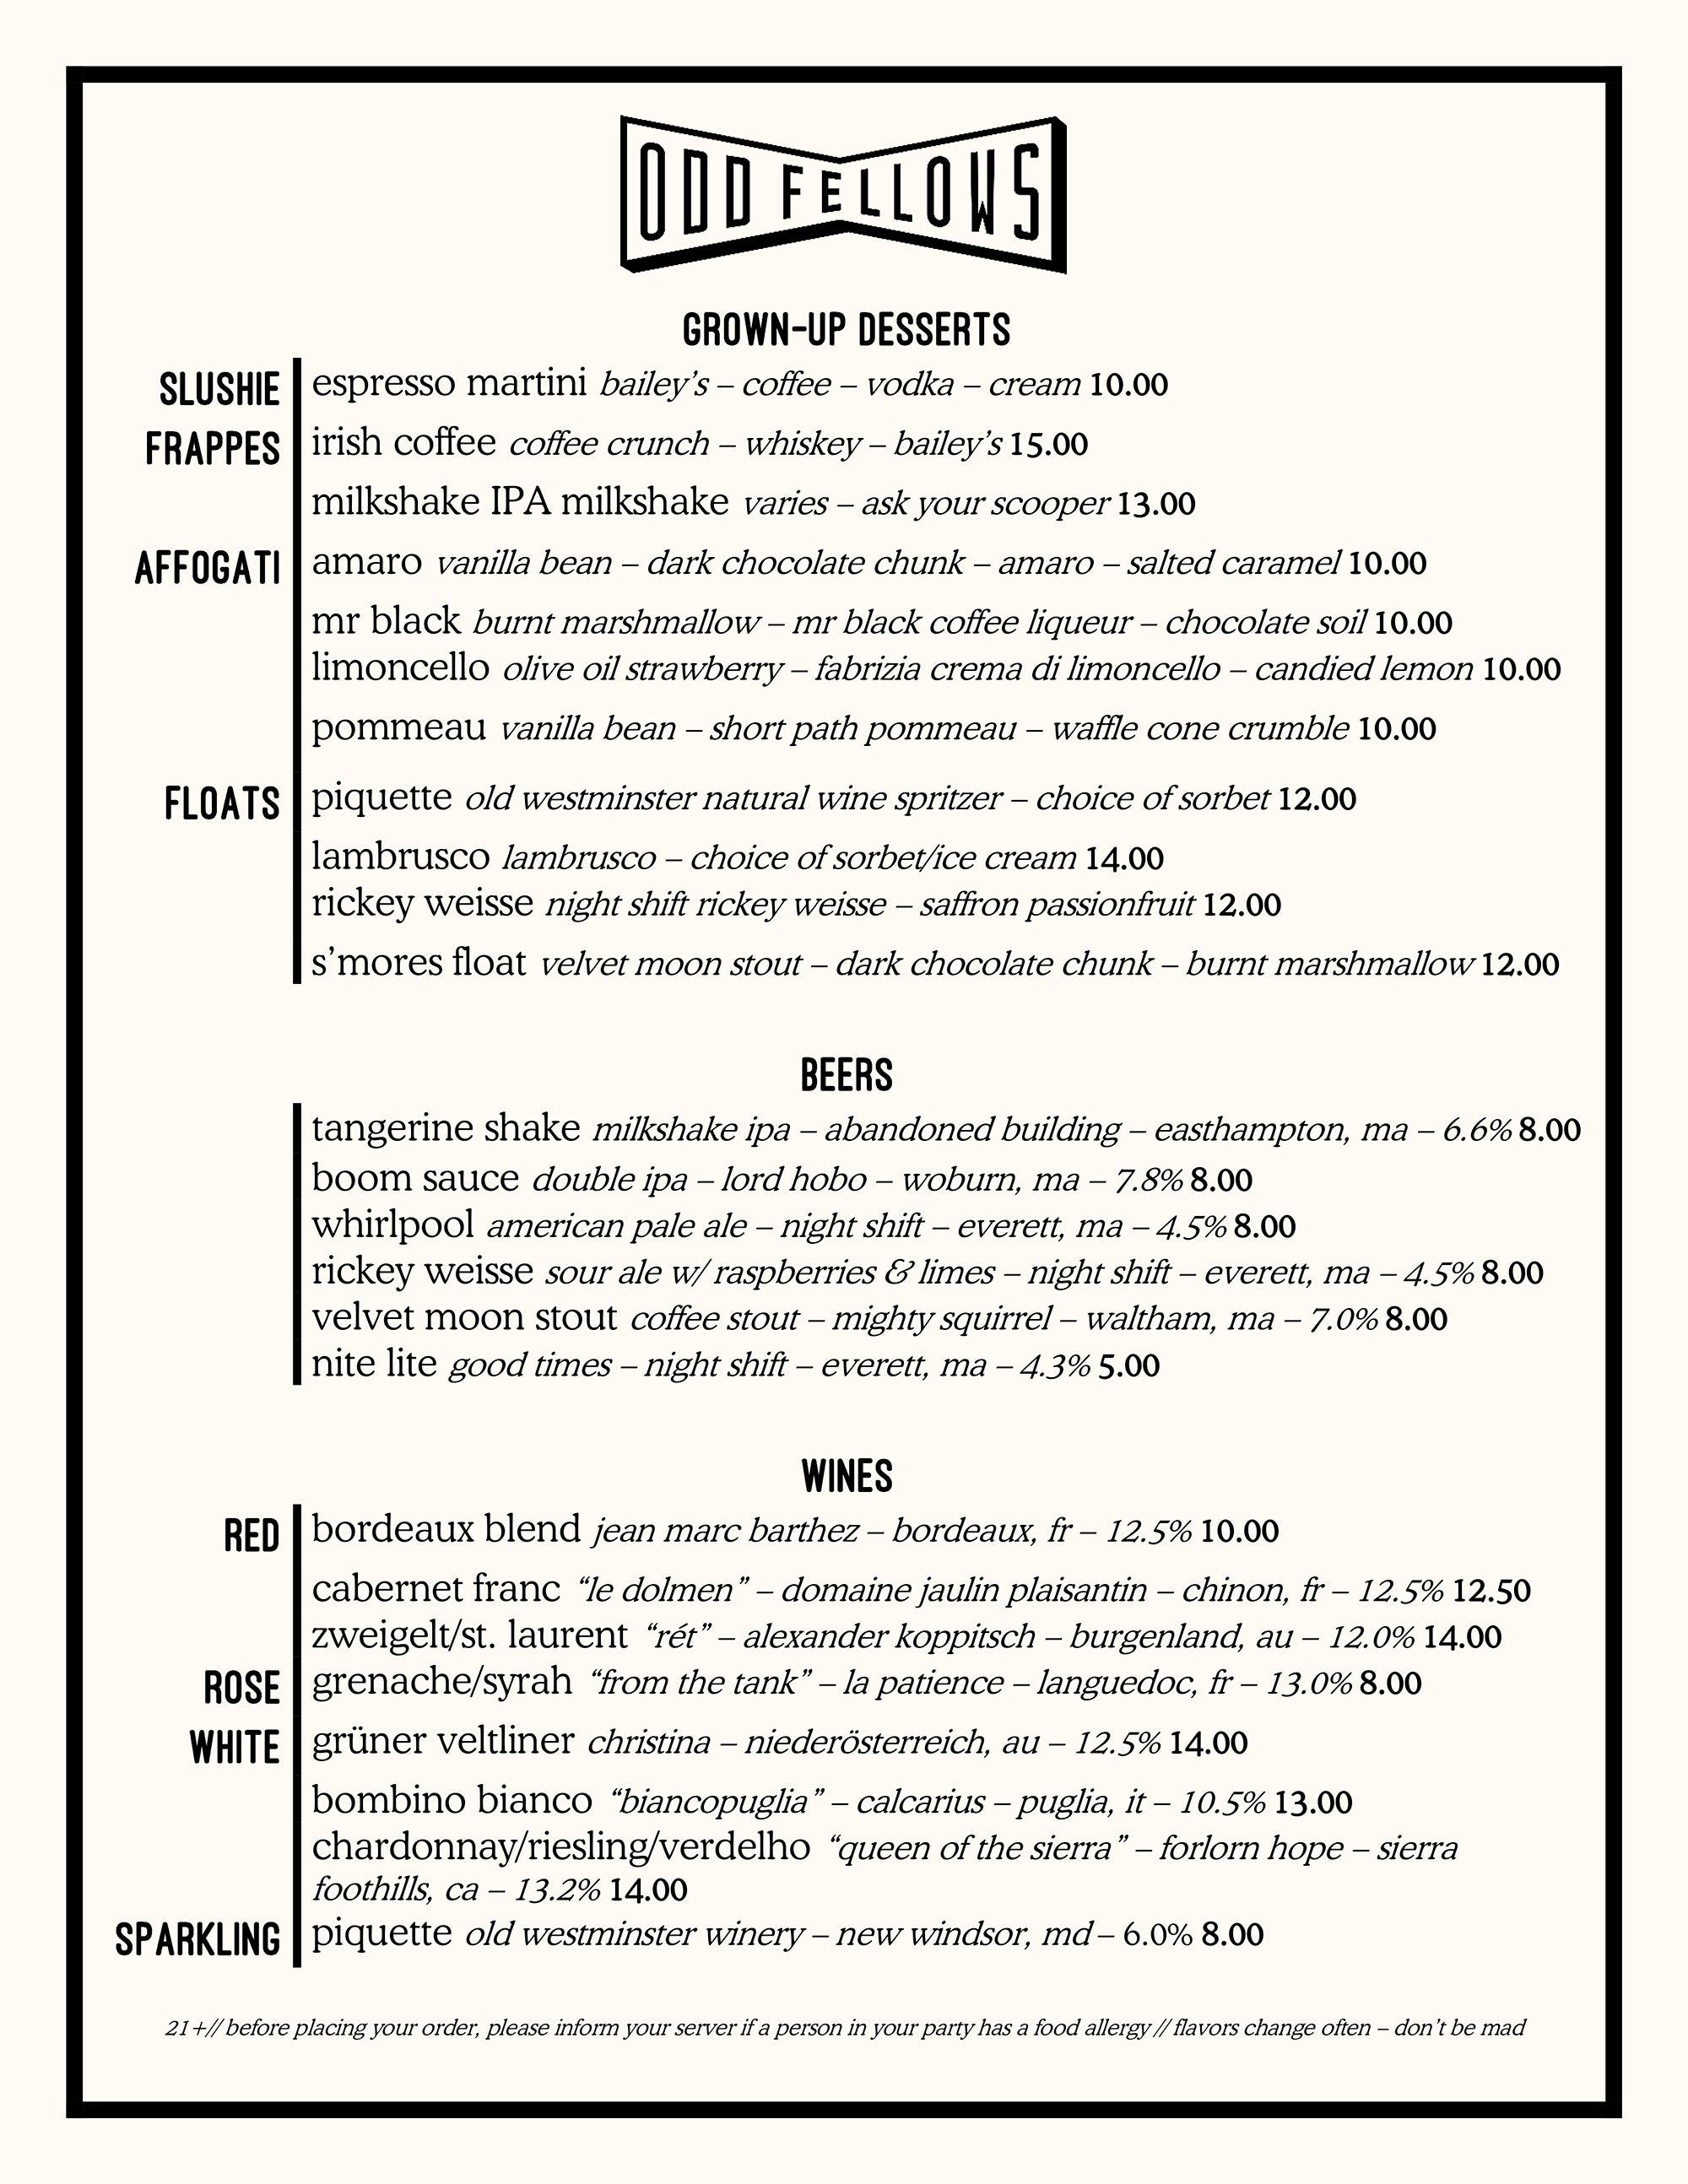 OddFellows Ice Cream Co. drink menu